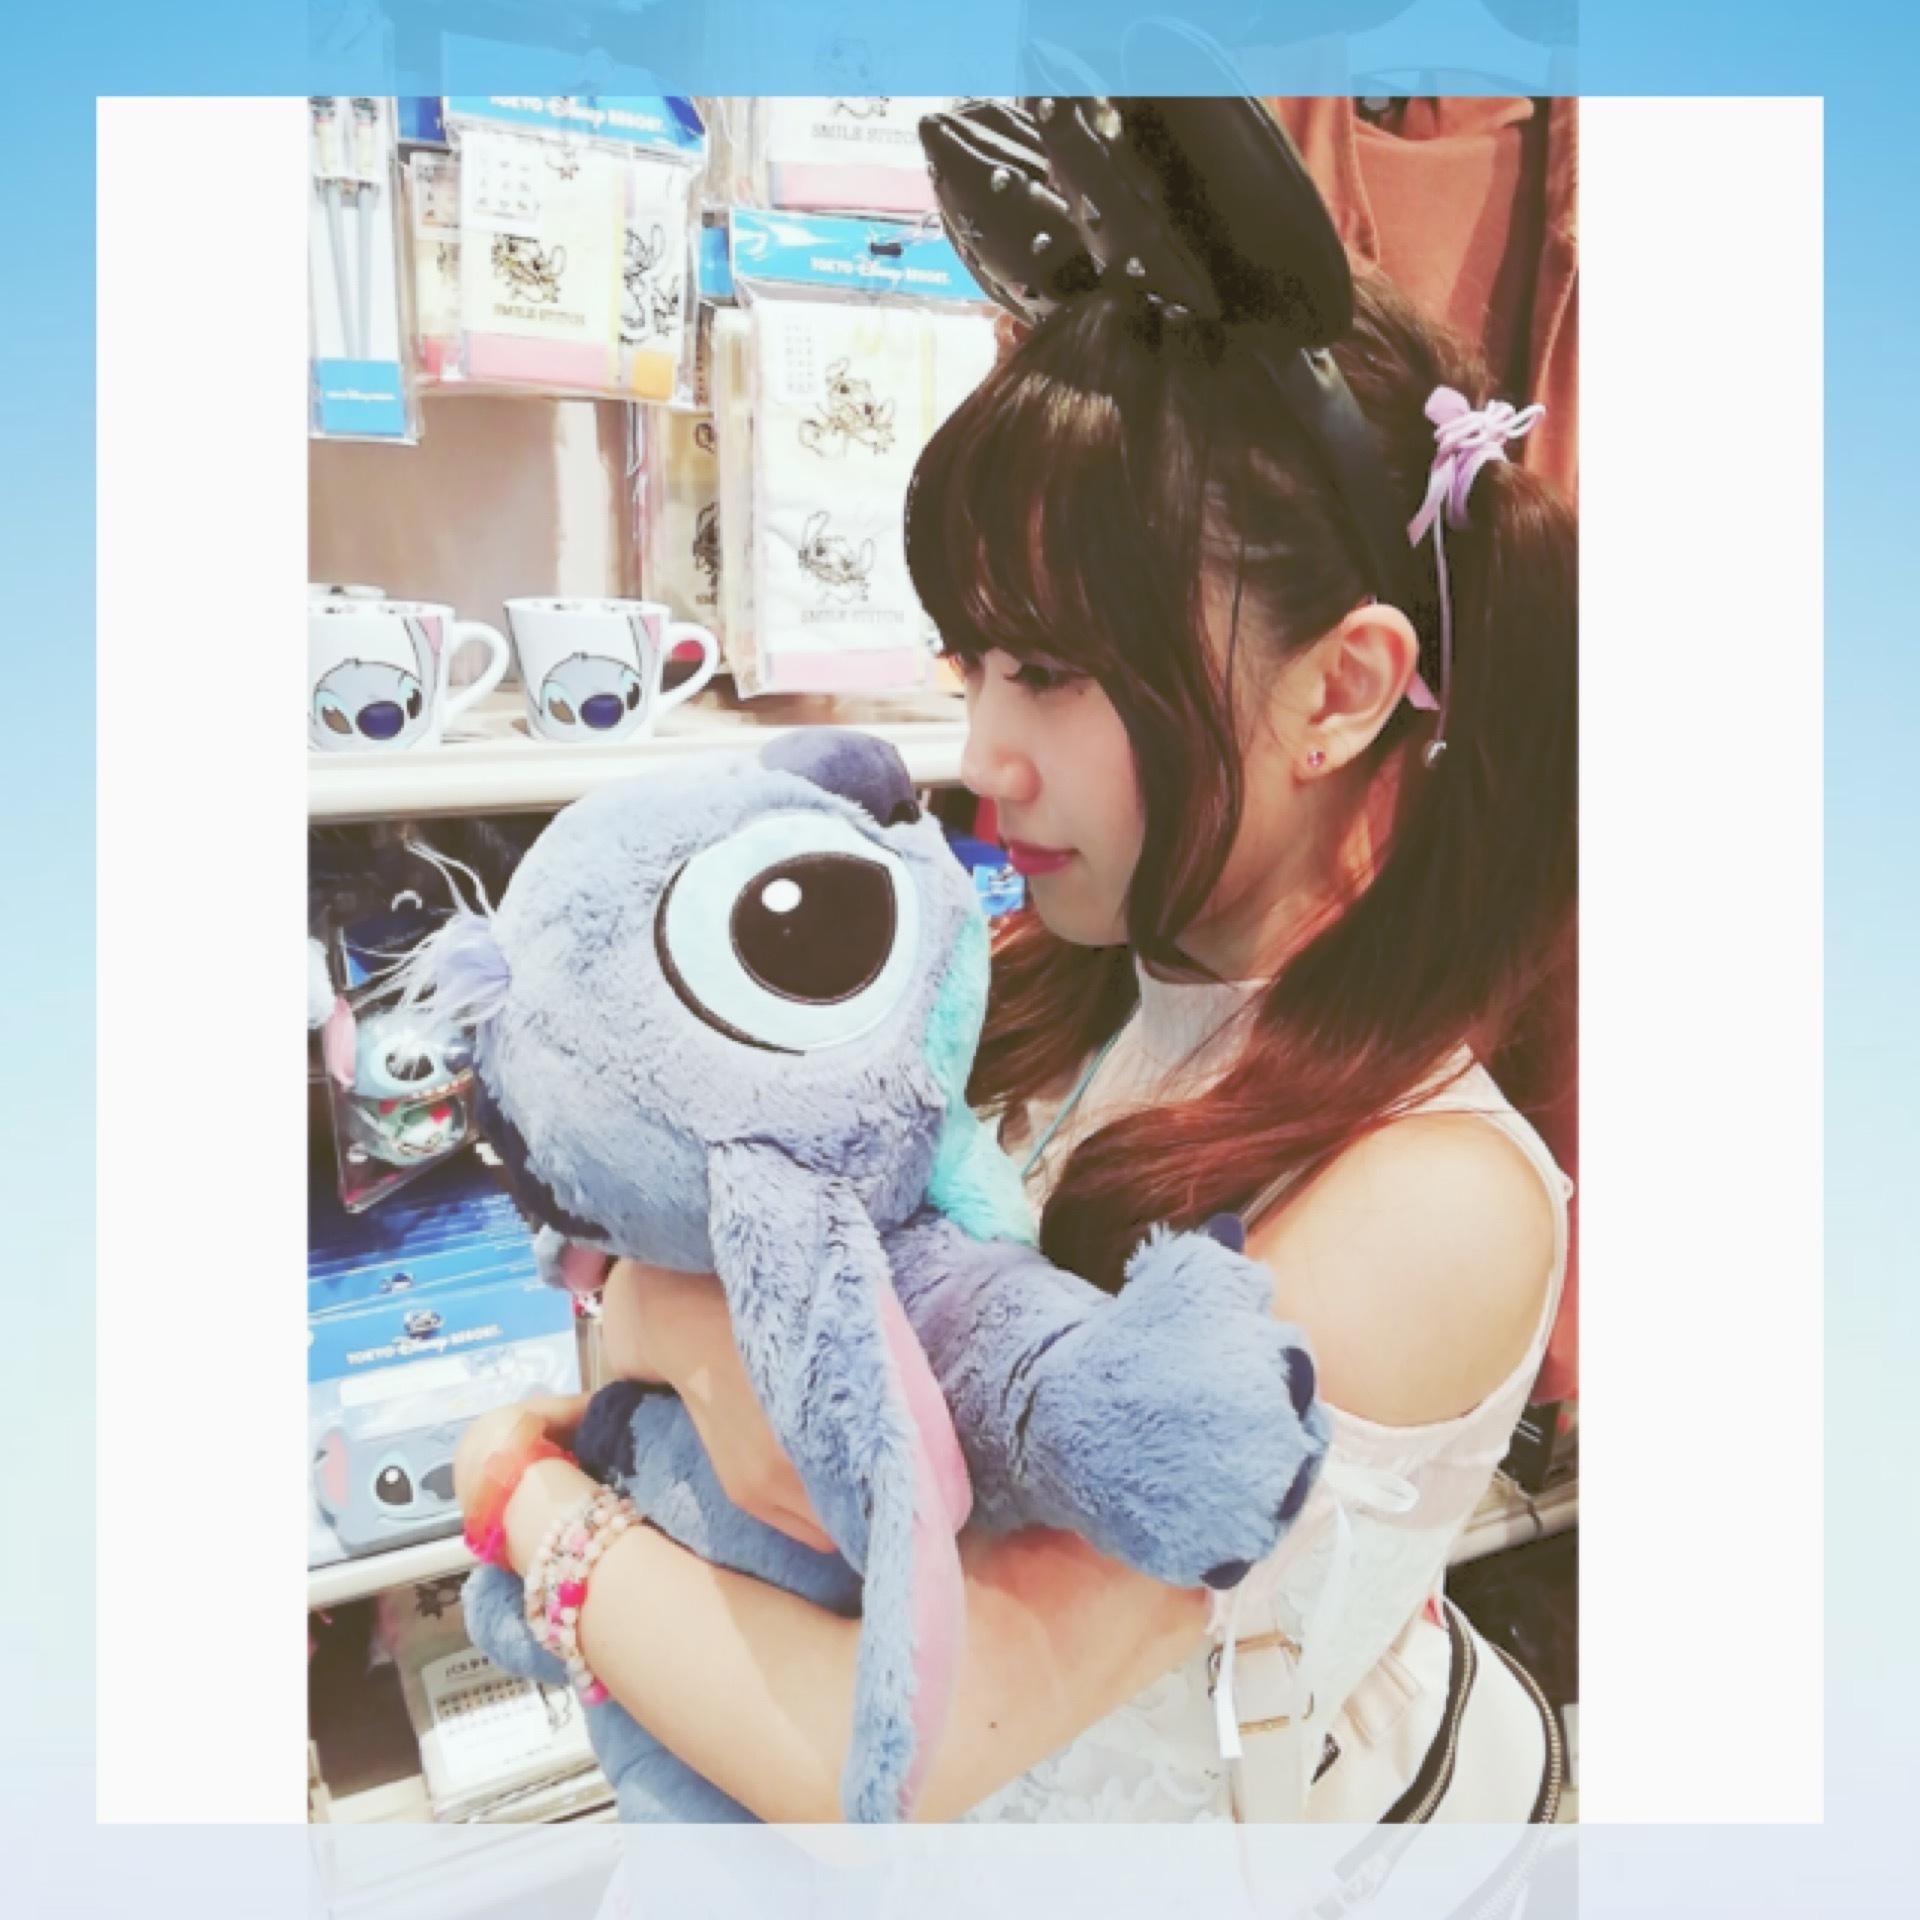 Tokyo Disneyland《 35 Happiest Gelebration! 》に行ってきました♫_1_6-1